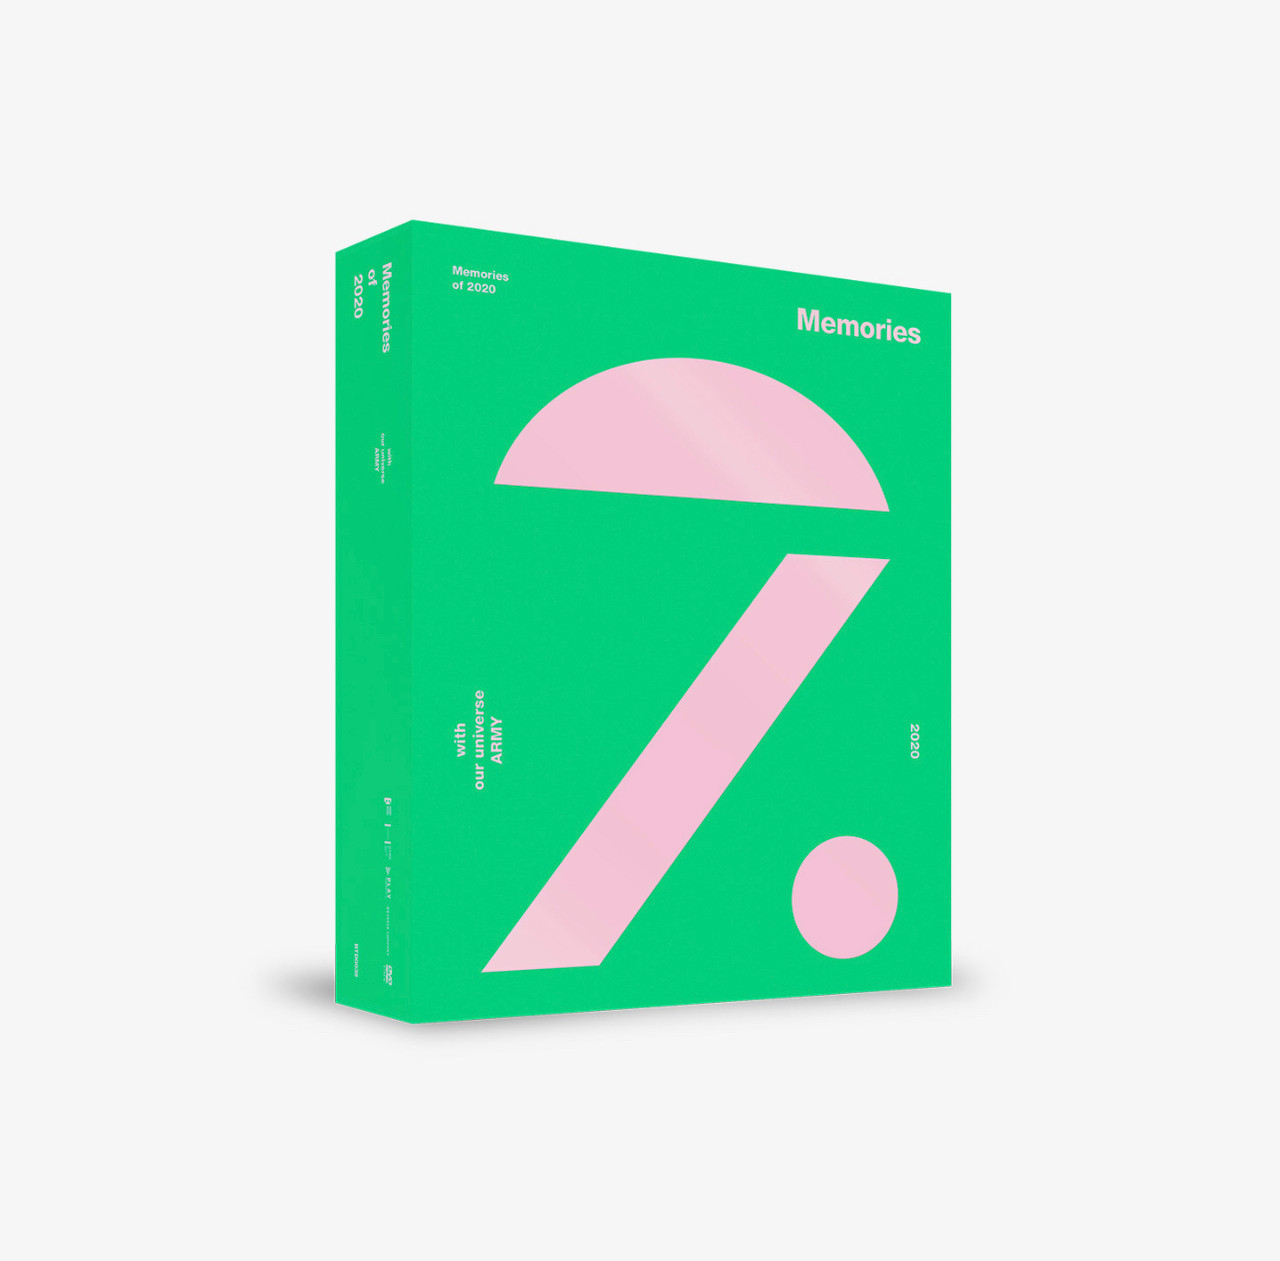 BTS - BTS MEMORIES OF 2020 DVD + Weverse Gift